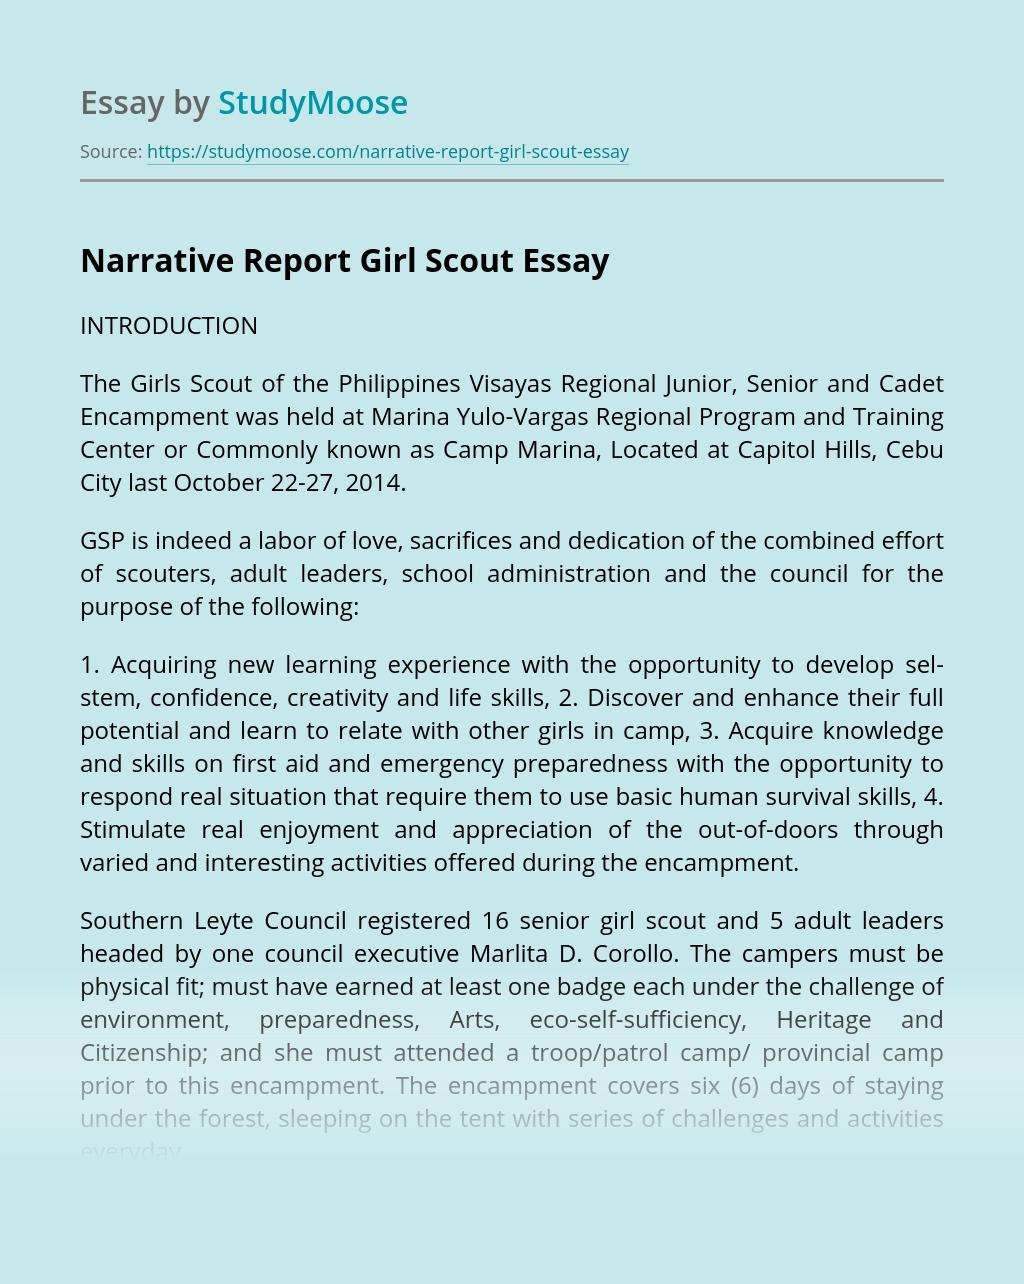 Narrative Report Girl Scout